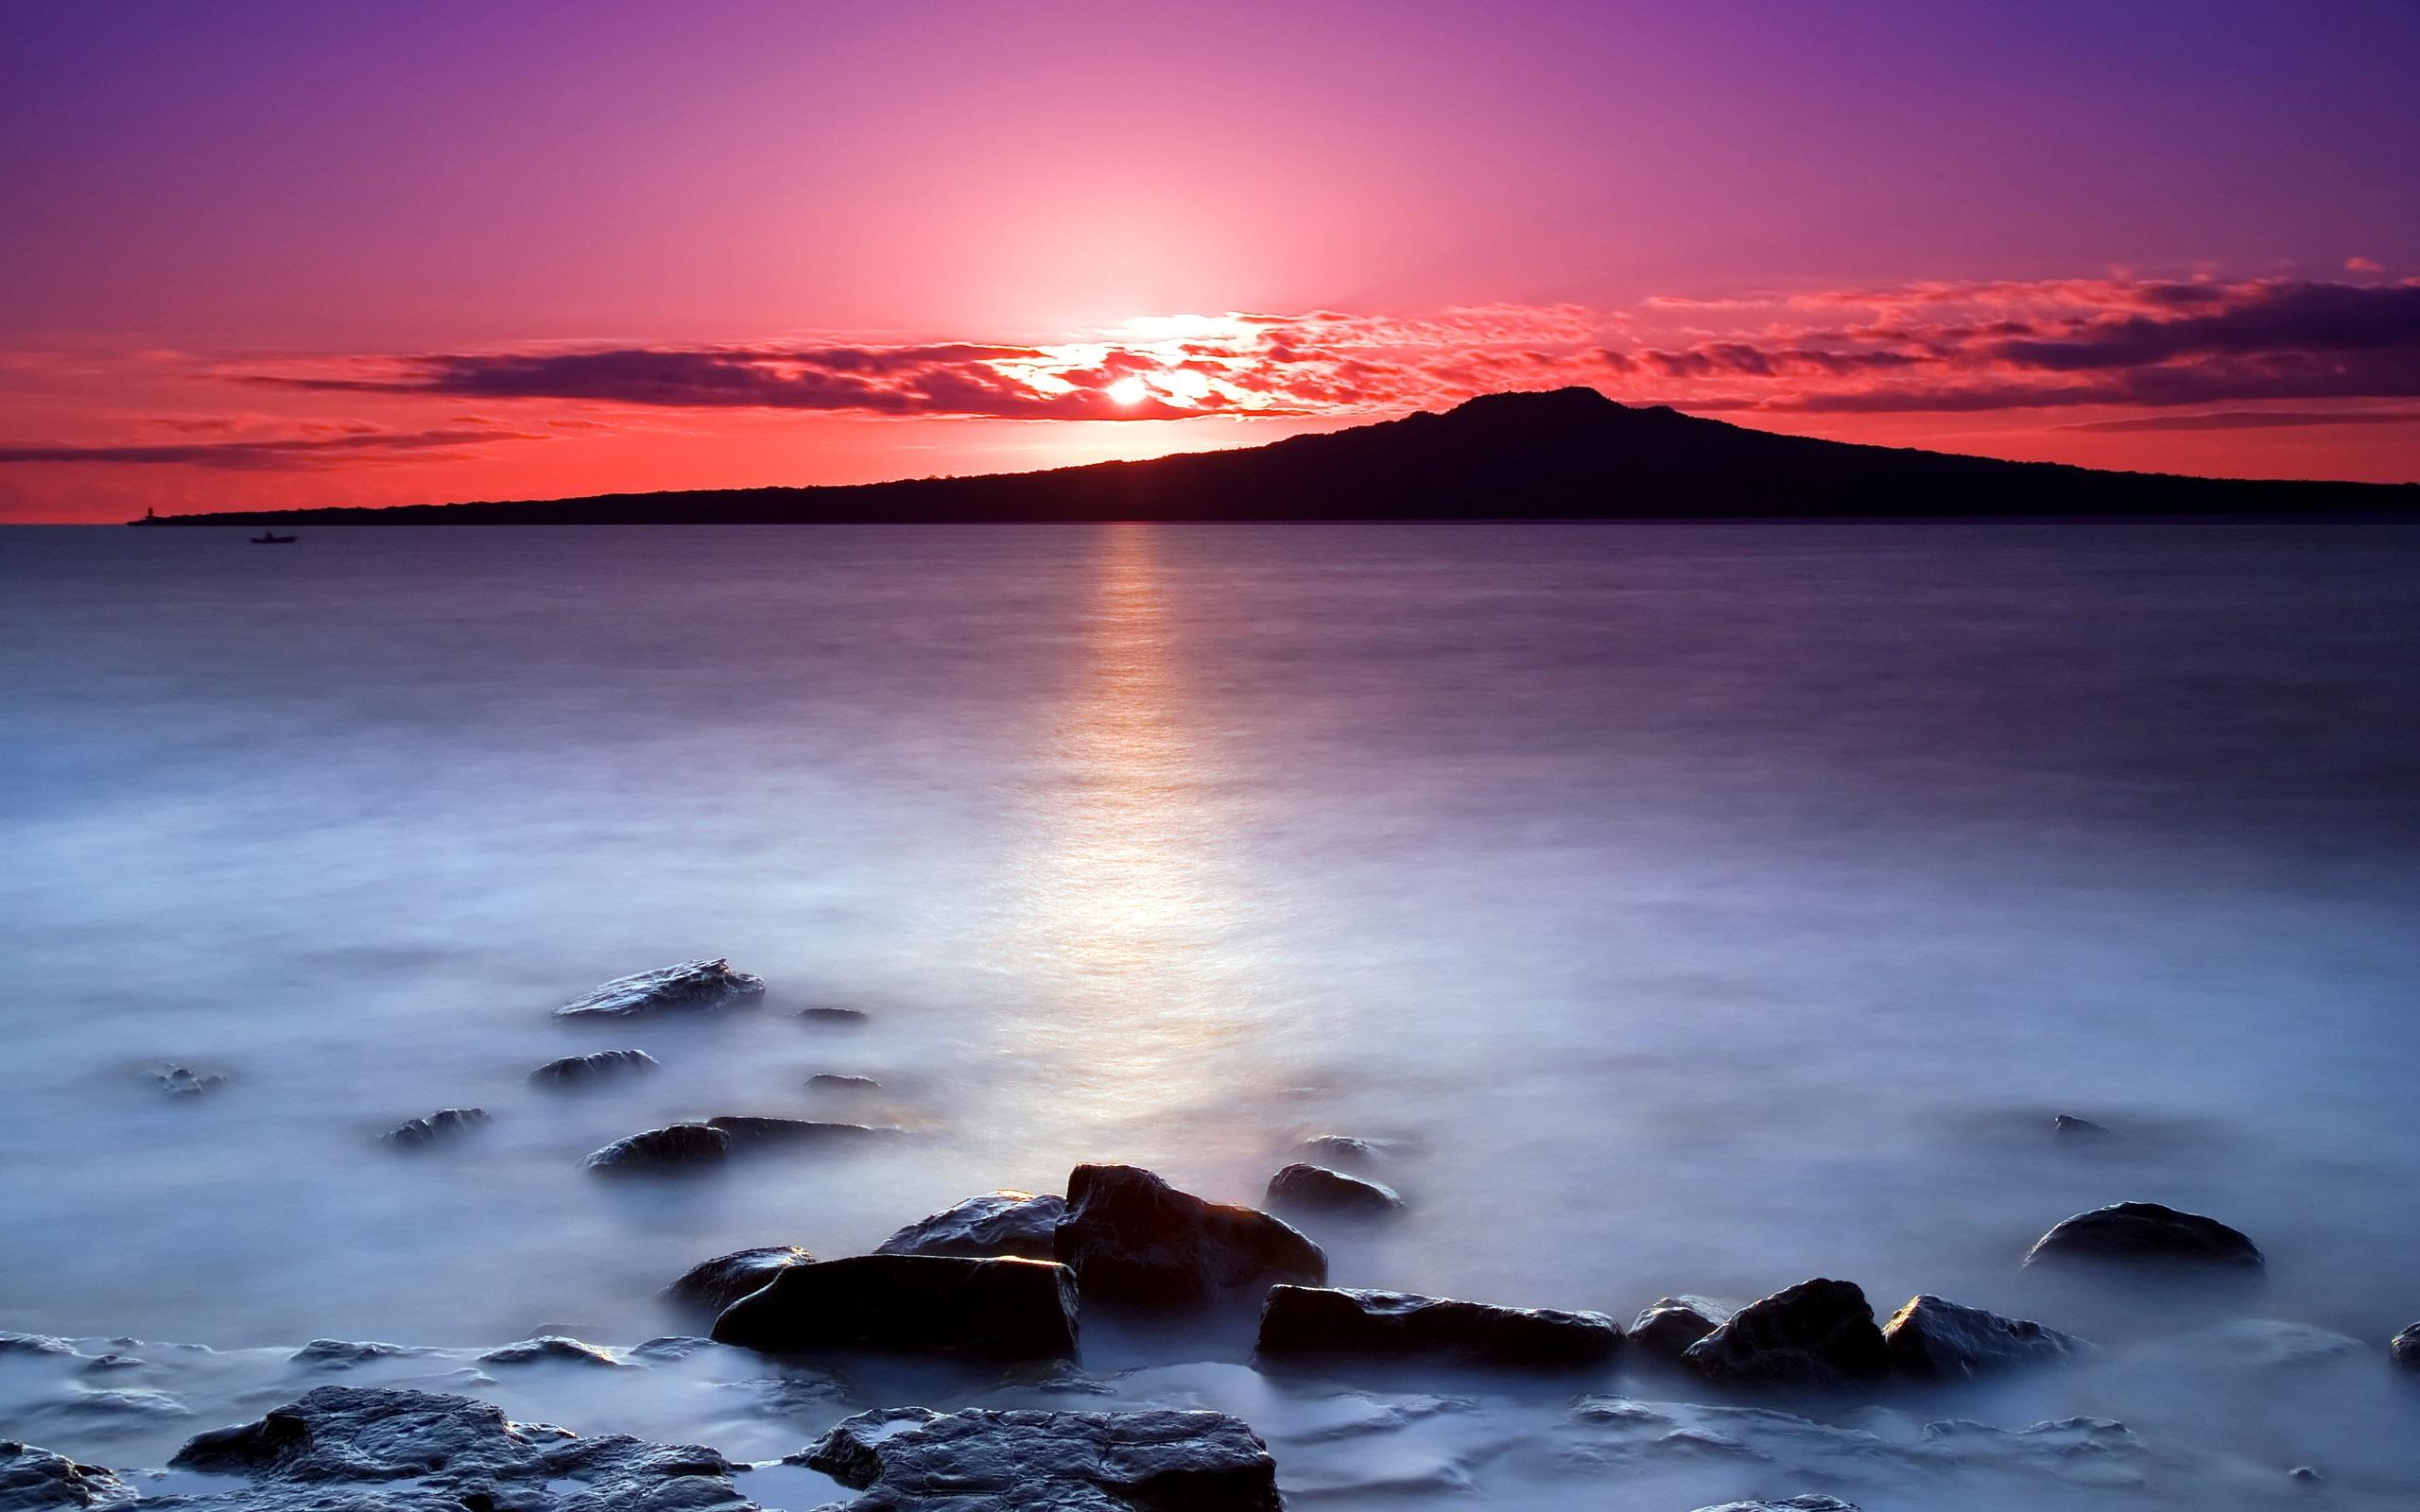 Free Download Large Coastal Coastal Scenery Wallpaper 1 1